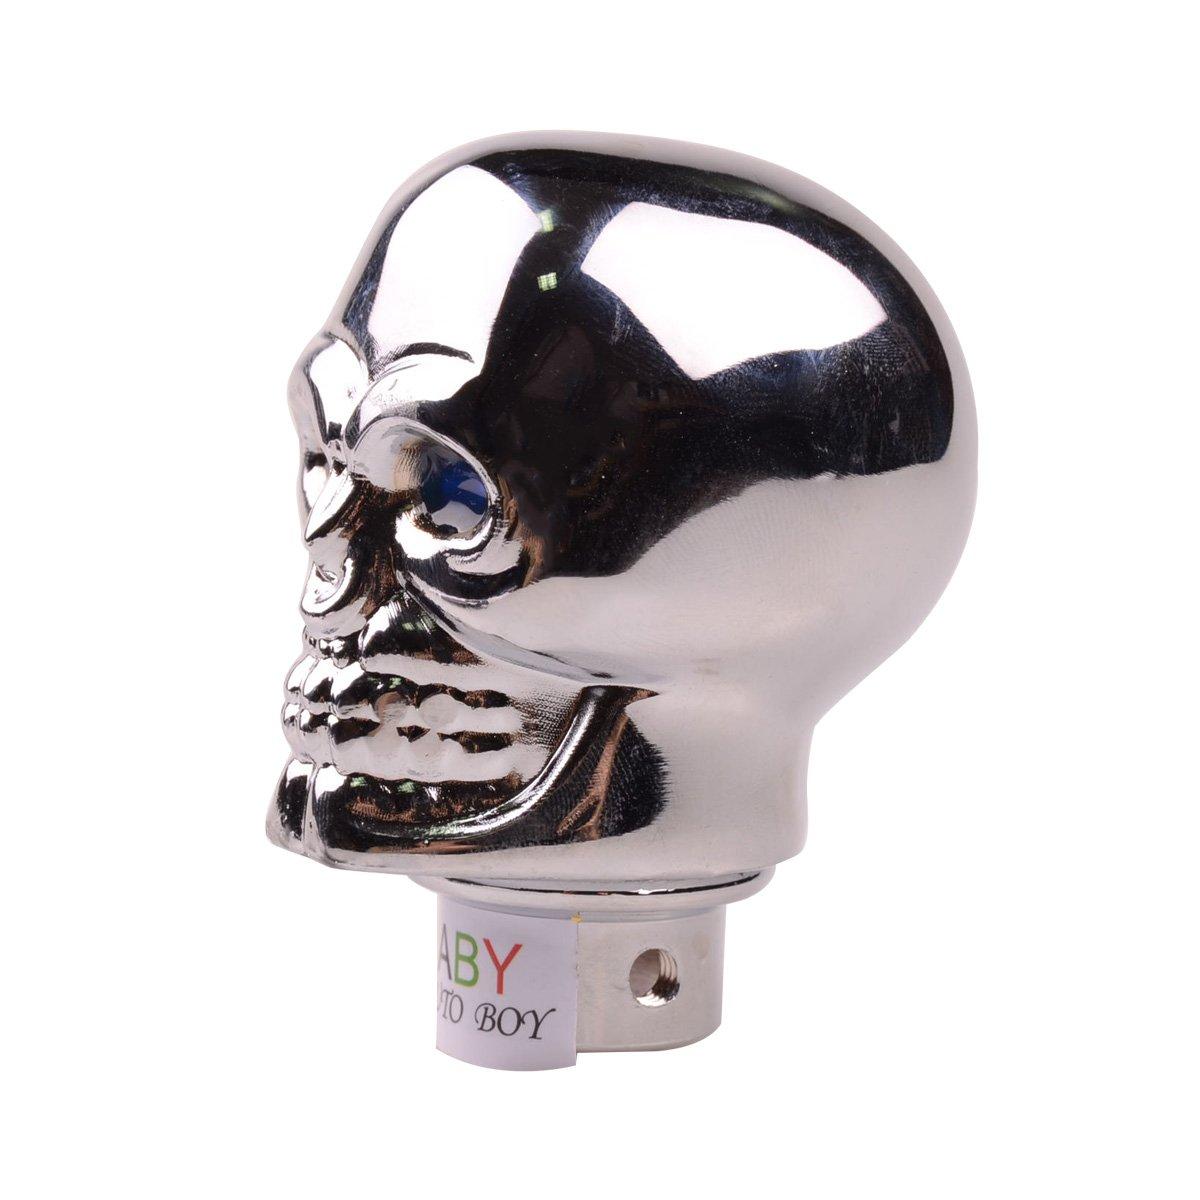 Automotive Interior Accessories ABy Skull Shape Auto Car Aluminium ...